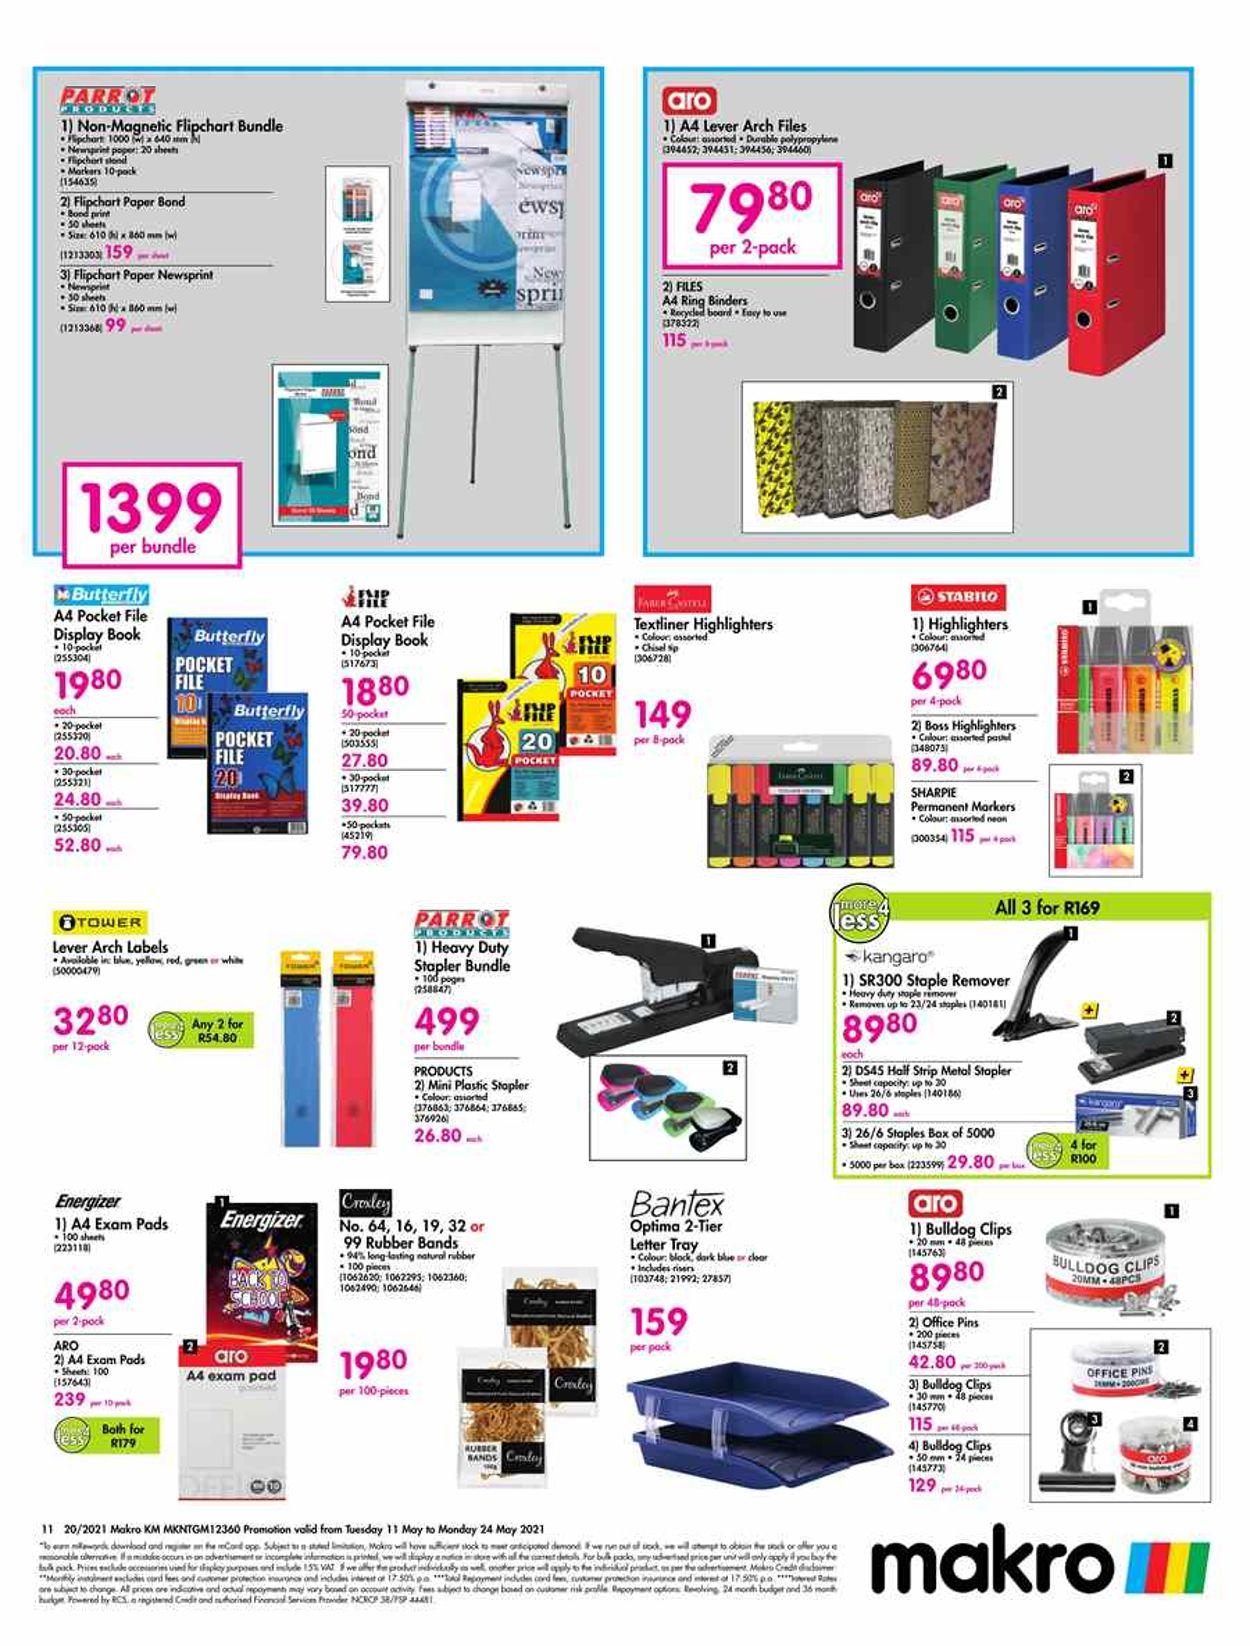 Makro Catalogue - 2021/05/11-2021/05/24 (Page 11)